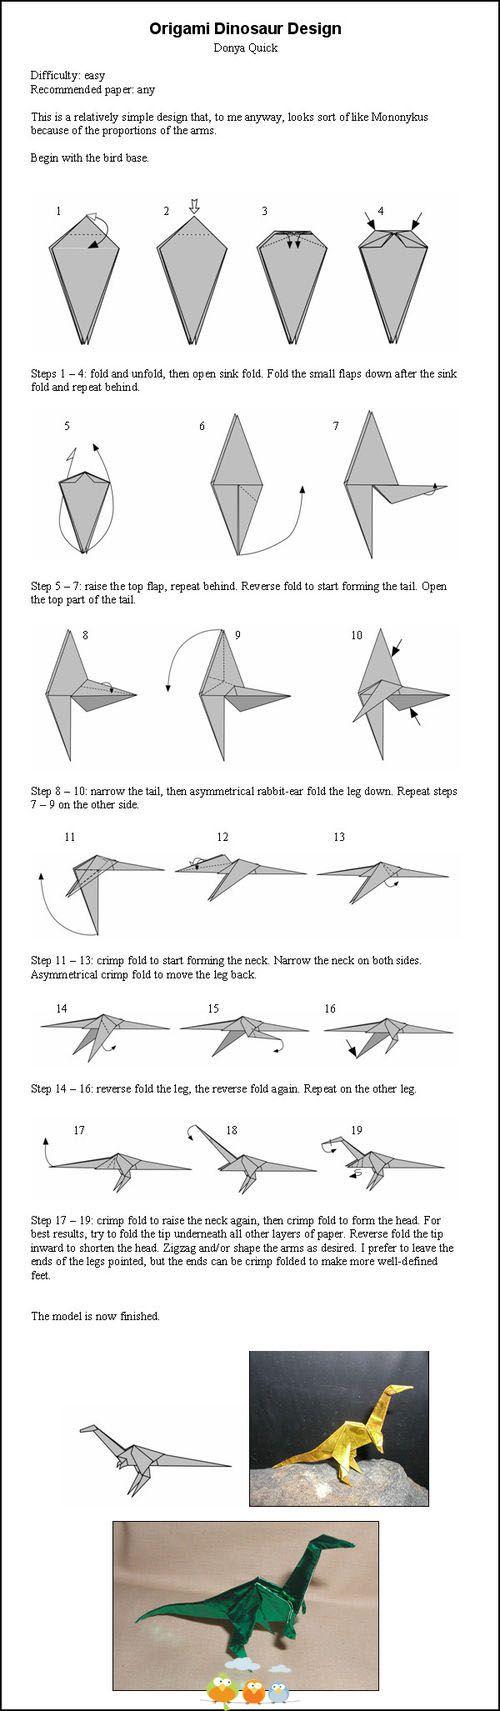 Dinozaver Dinosaure Origami Pinterest Dragon Instructions Diagram Paper Folding Art Love Oragami Dinosaur